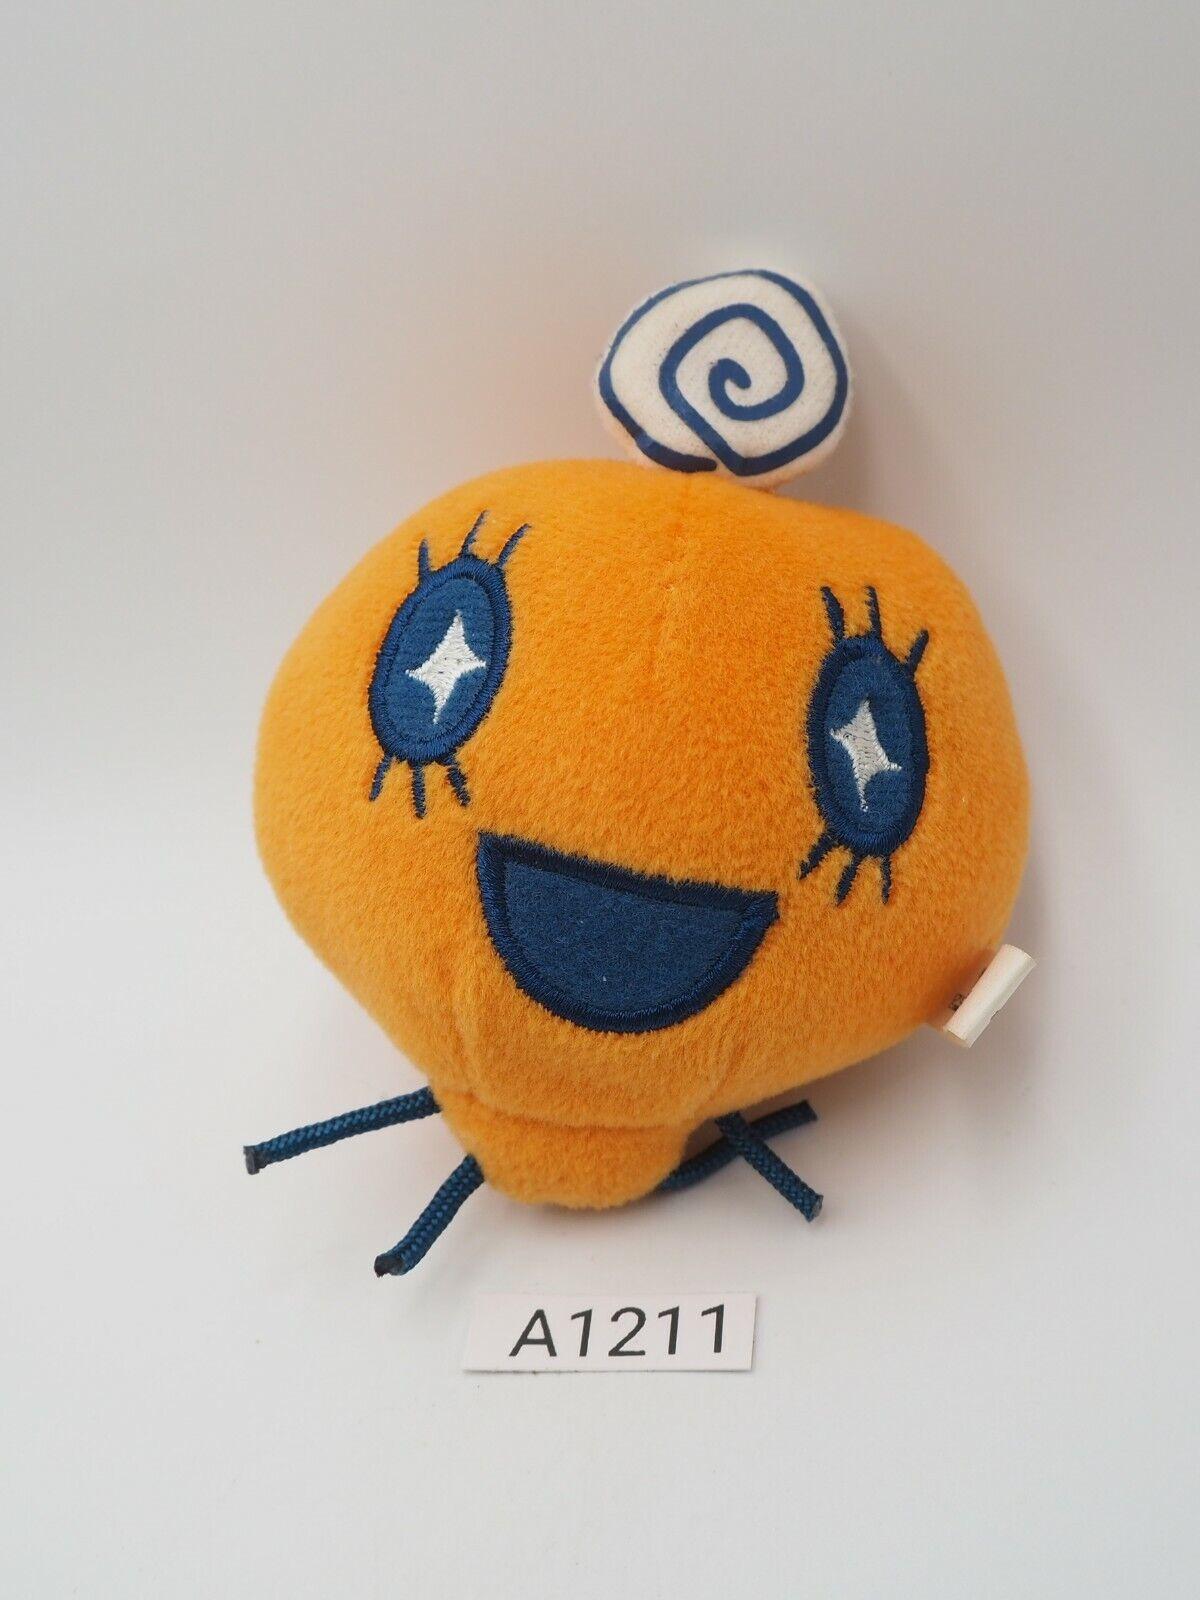 Tamagotchi BANPRESTO Big Plush Set Toy Soft Plush Stuffed Toy Doll From Japan